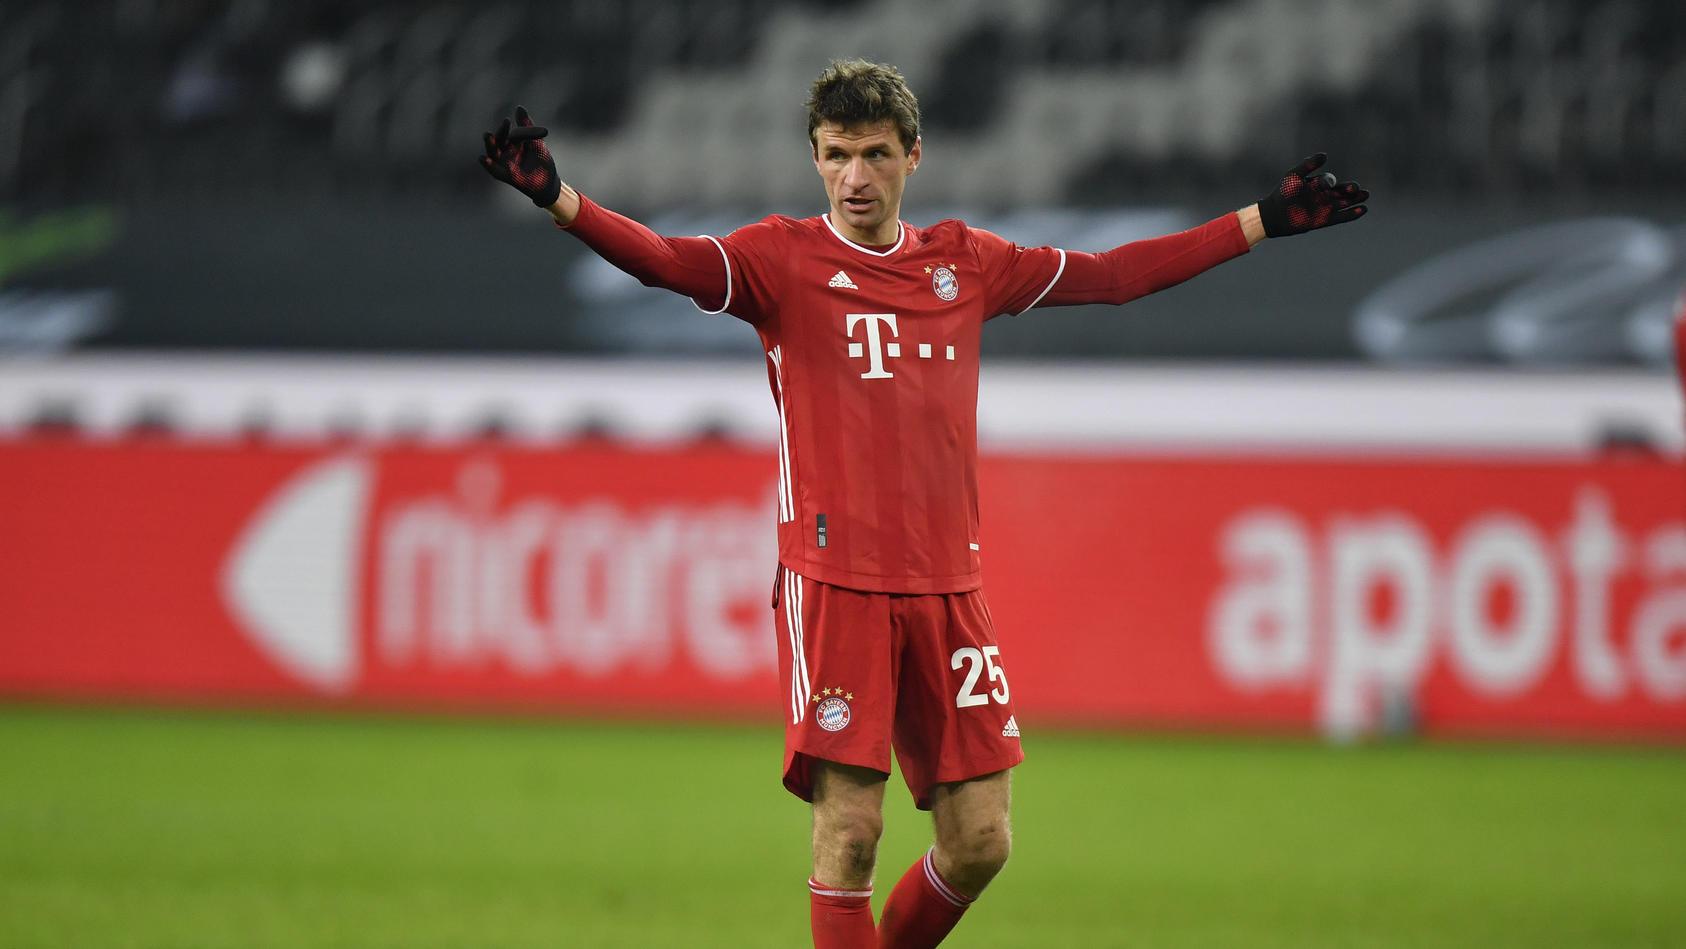 Thomas Müller mit dem regulären Trikot der Bayern